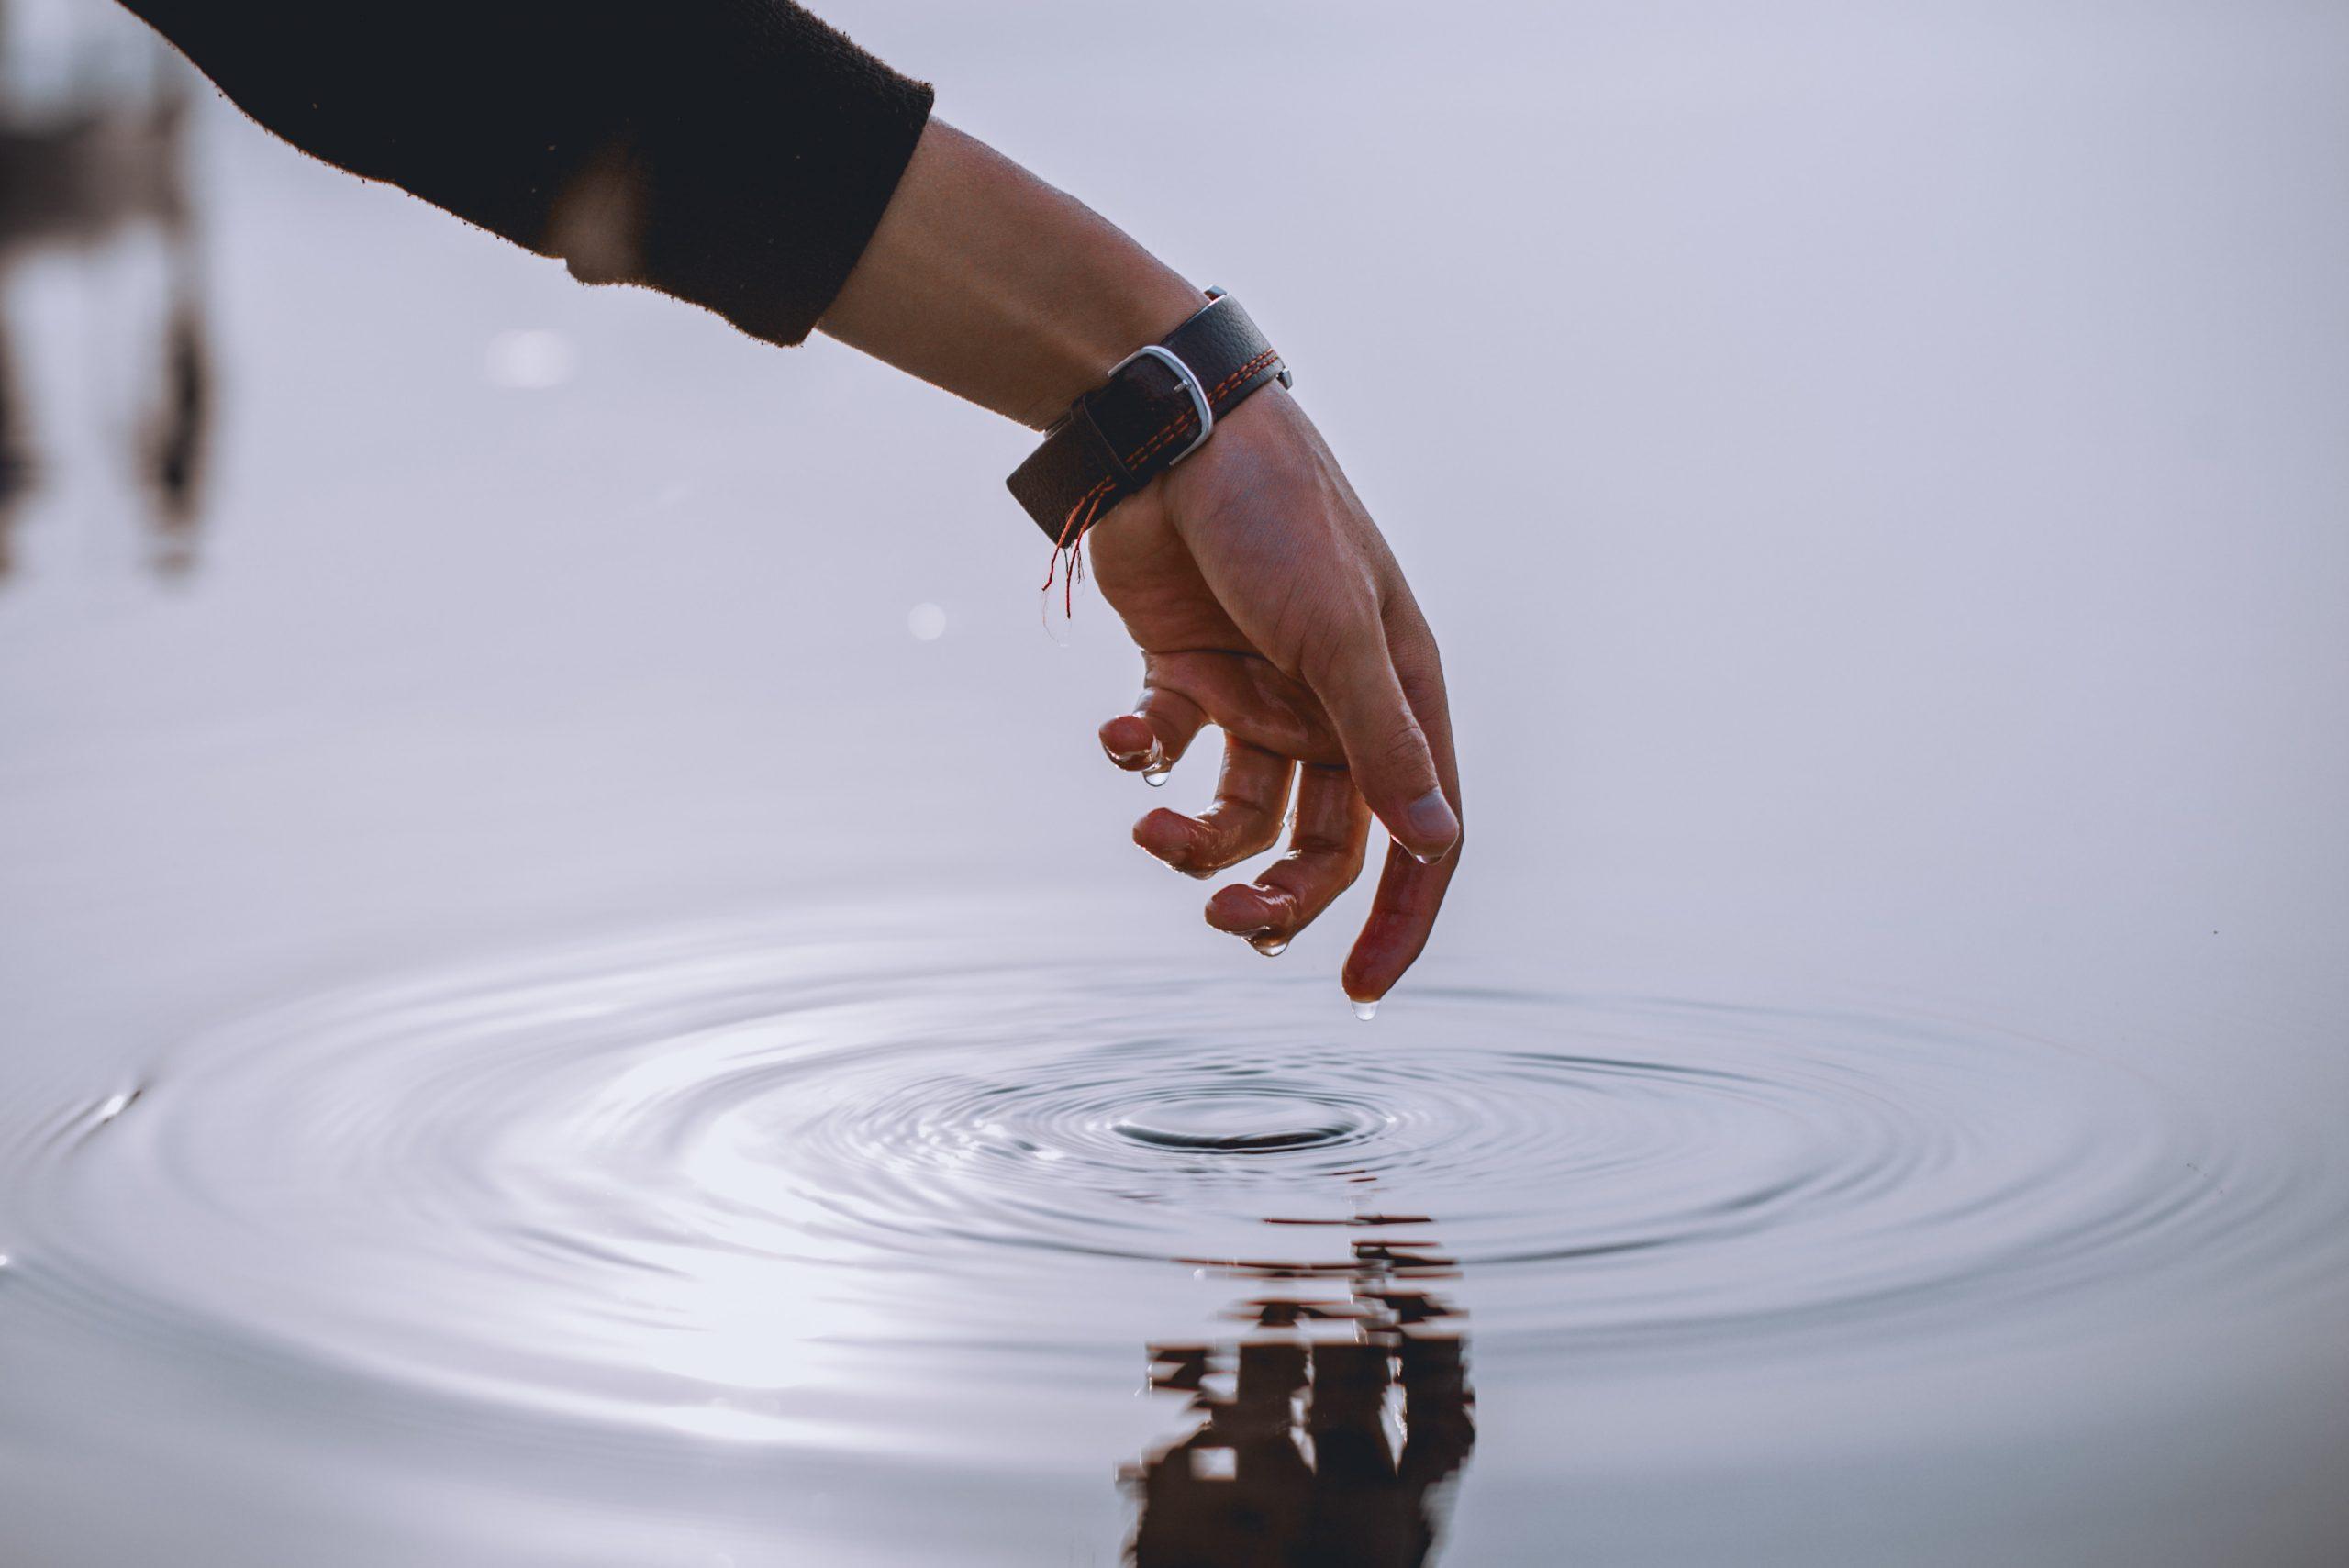 Finger touching water